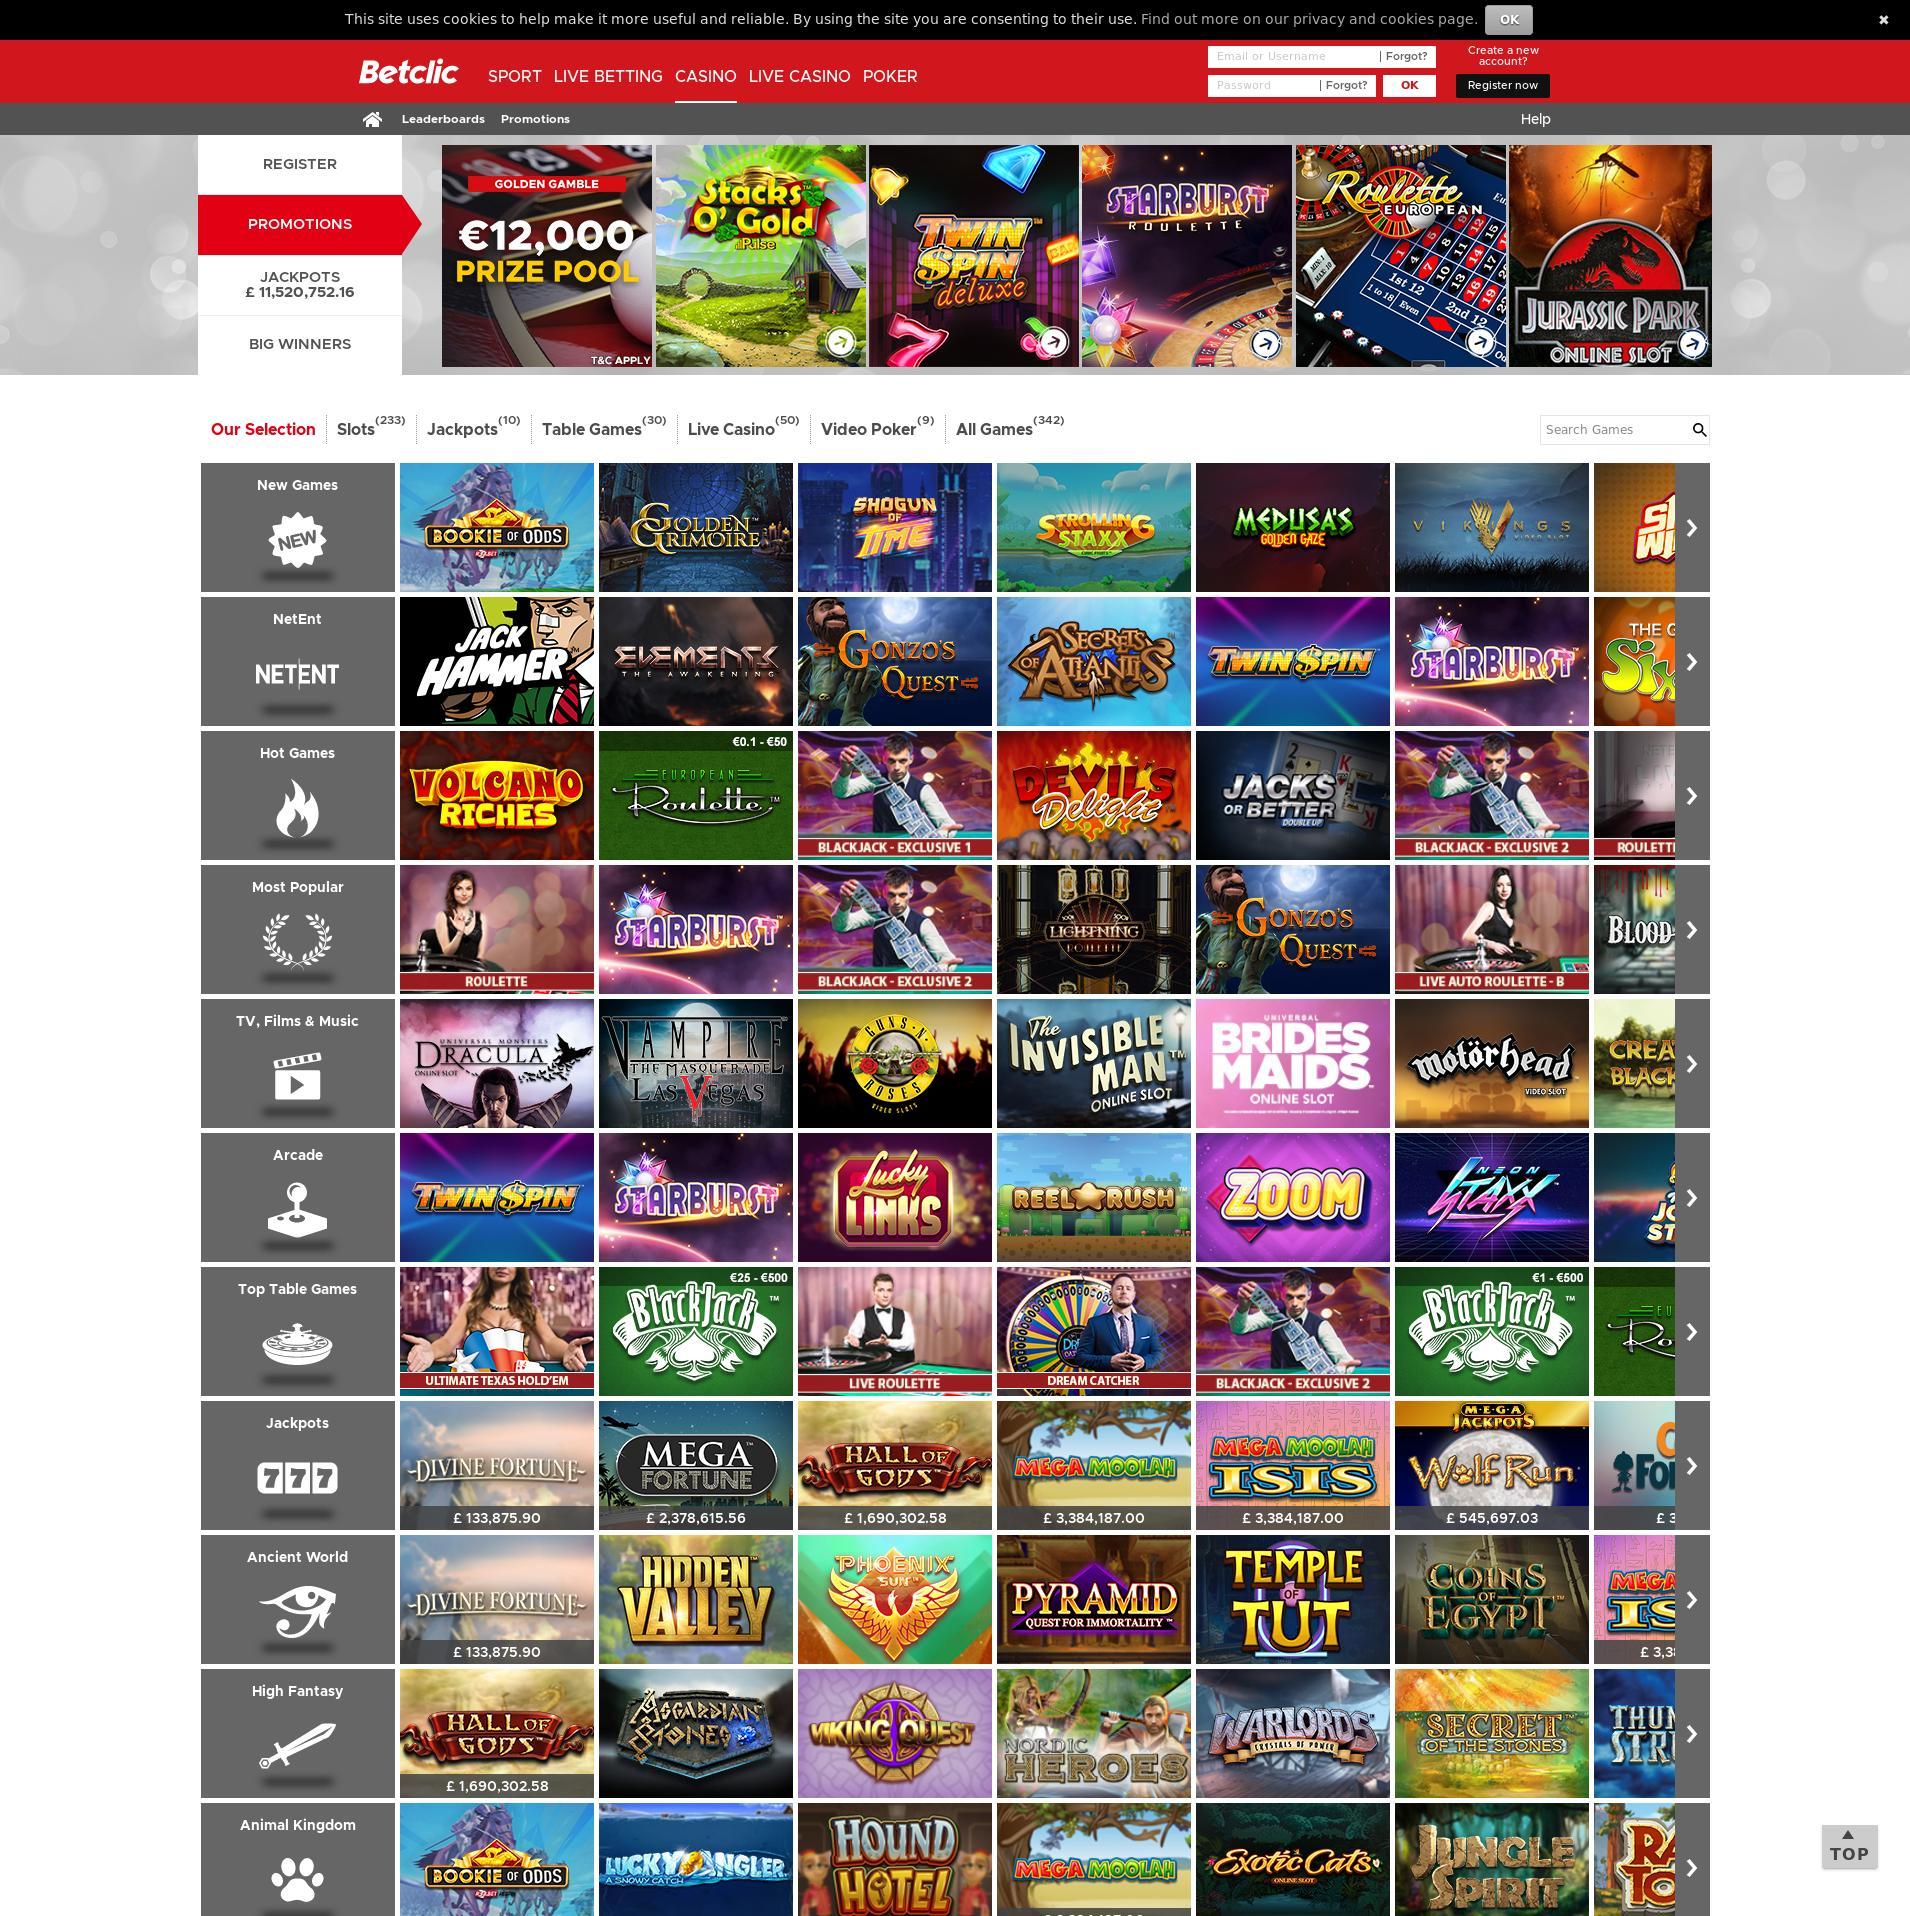 Casino screen Lobby 2019-10-18 for United Kingdom